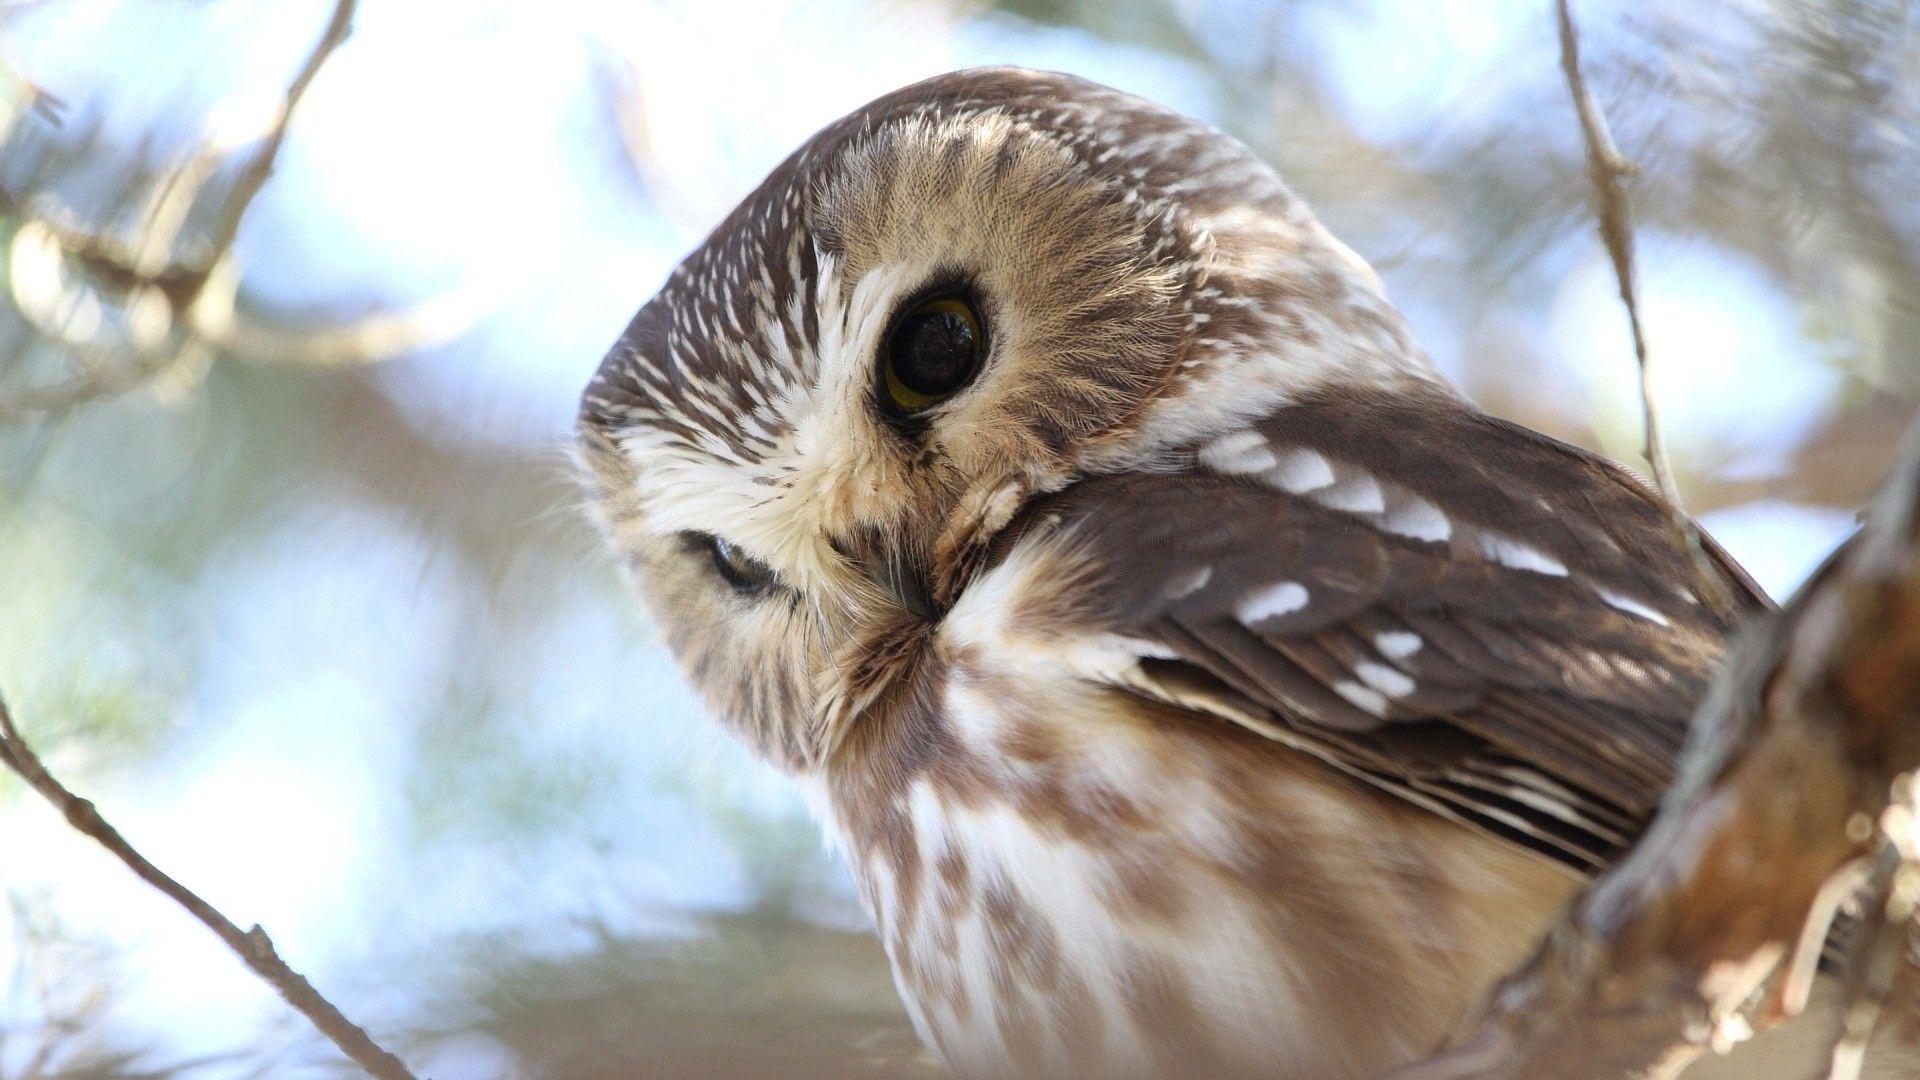 67 Owl Screensavers Wallpapers On Wallpaperplay In 2020 Owl Wallpaper Cute Owls Wallpaper Owl Pictures